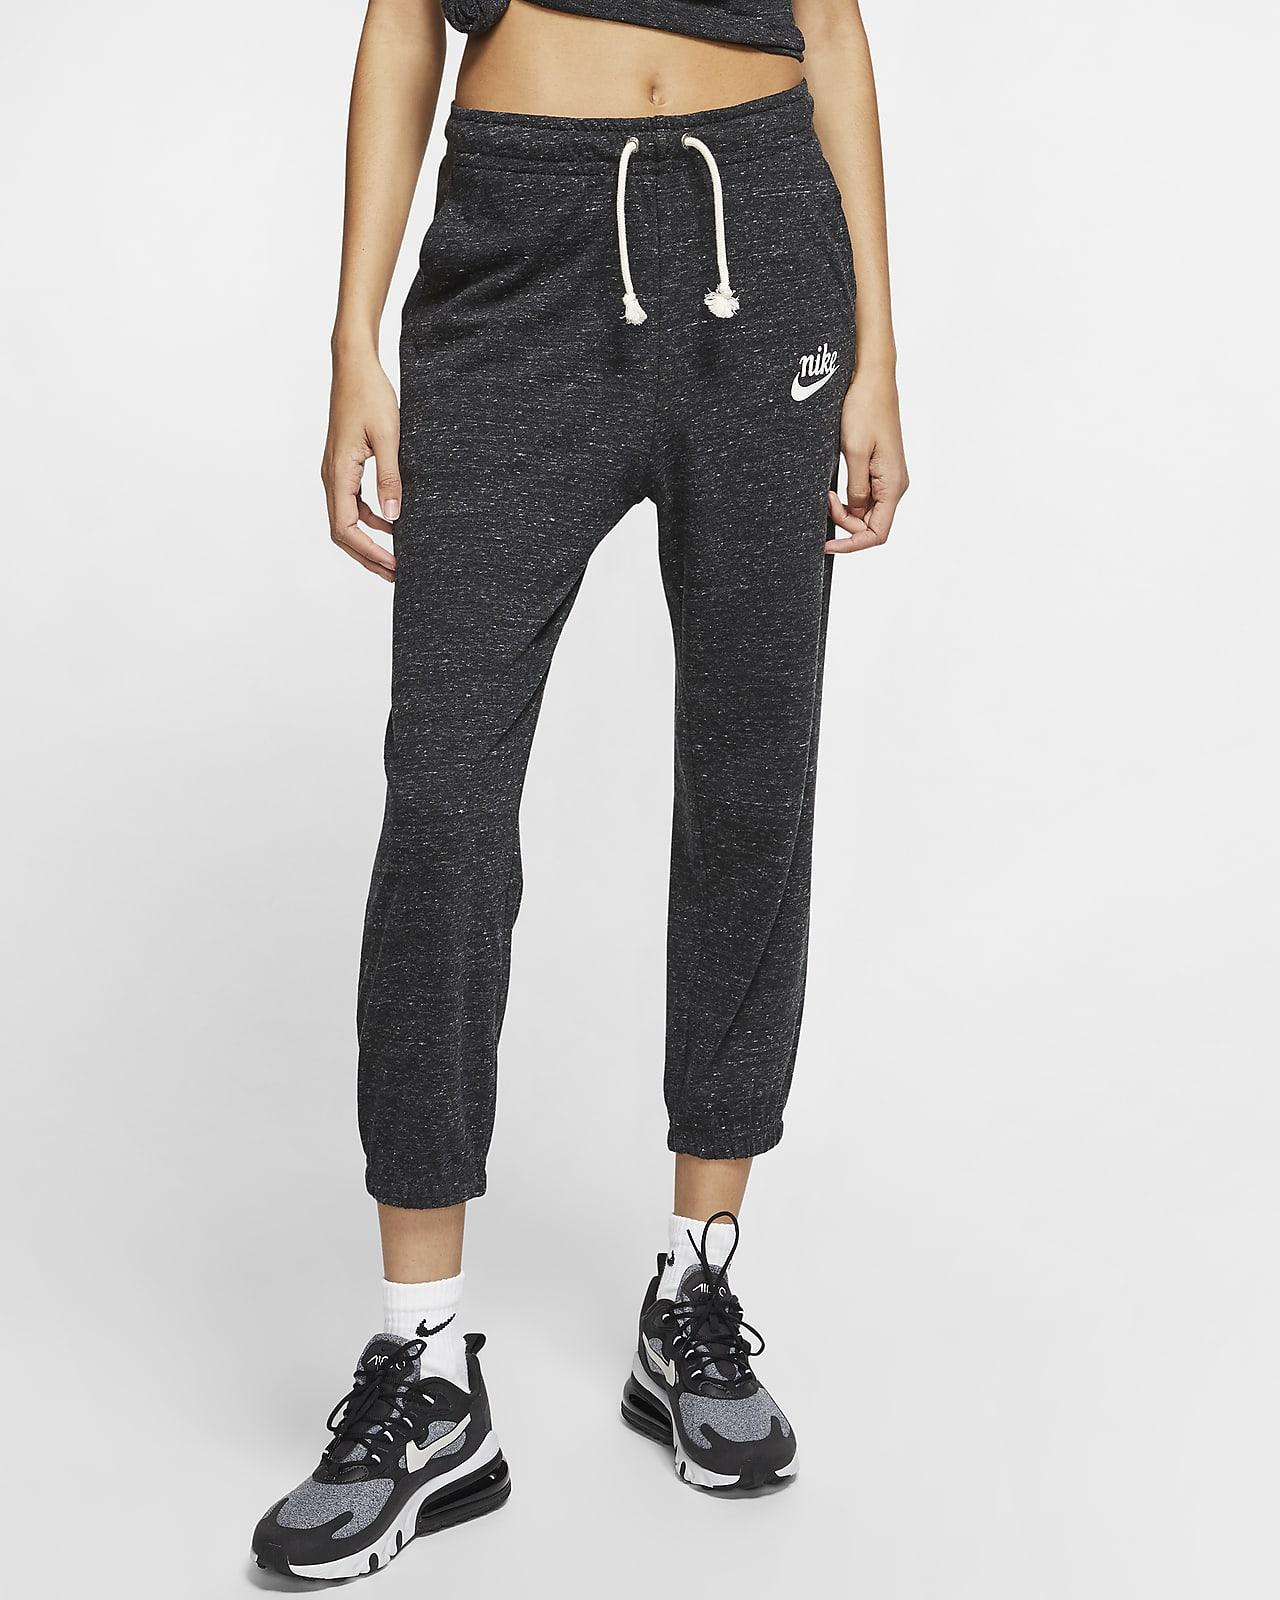 Nike Sportswear Gym Vintage Women's Capris